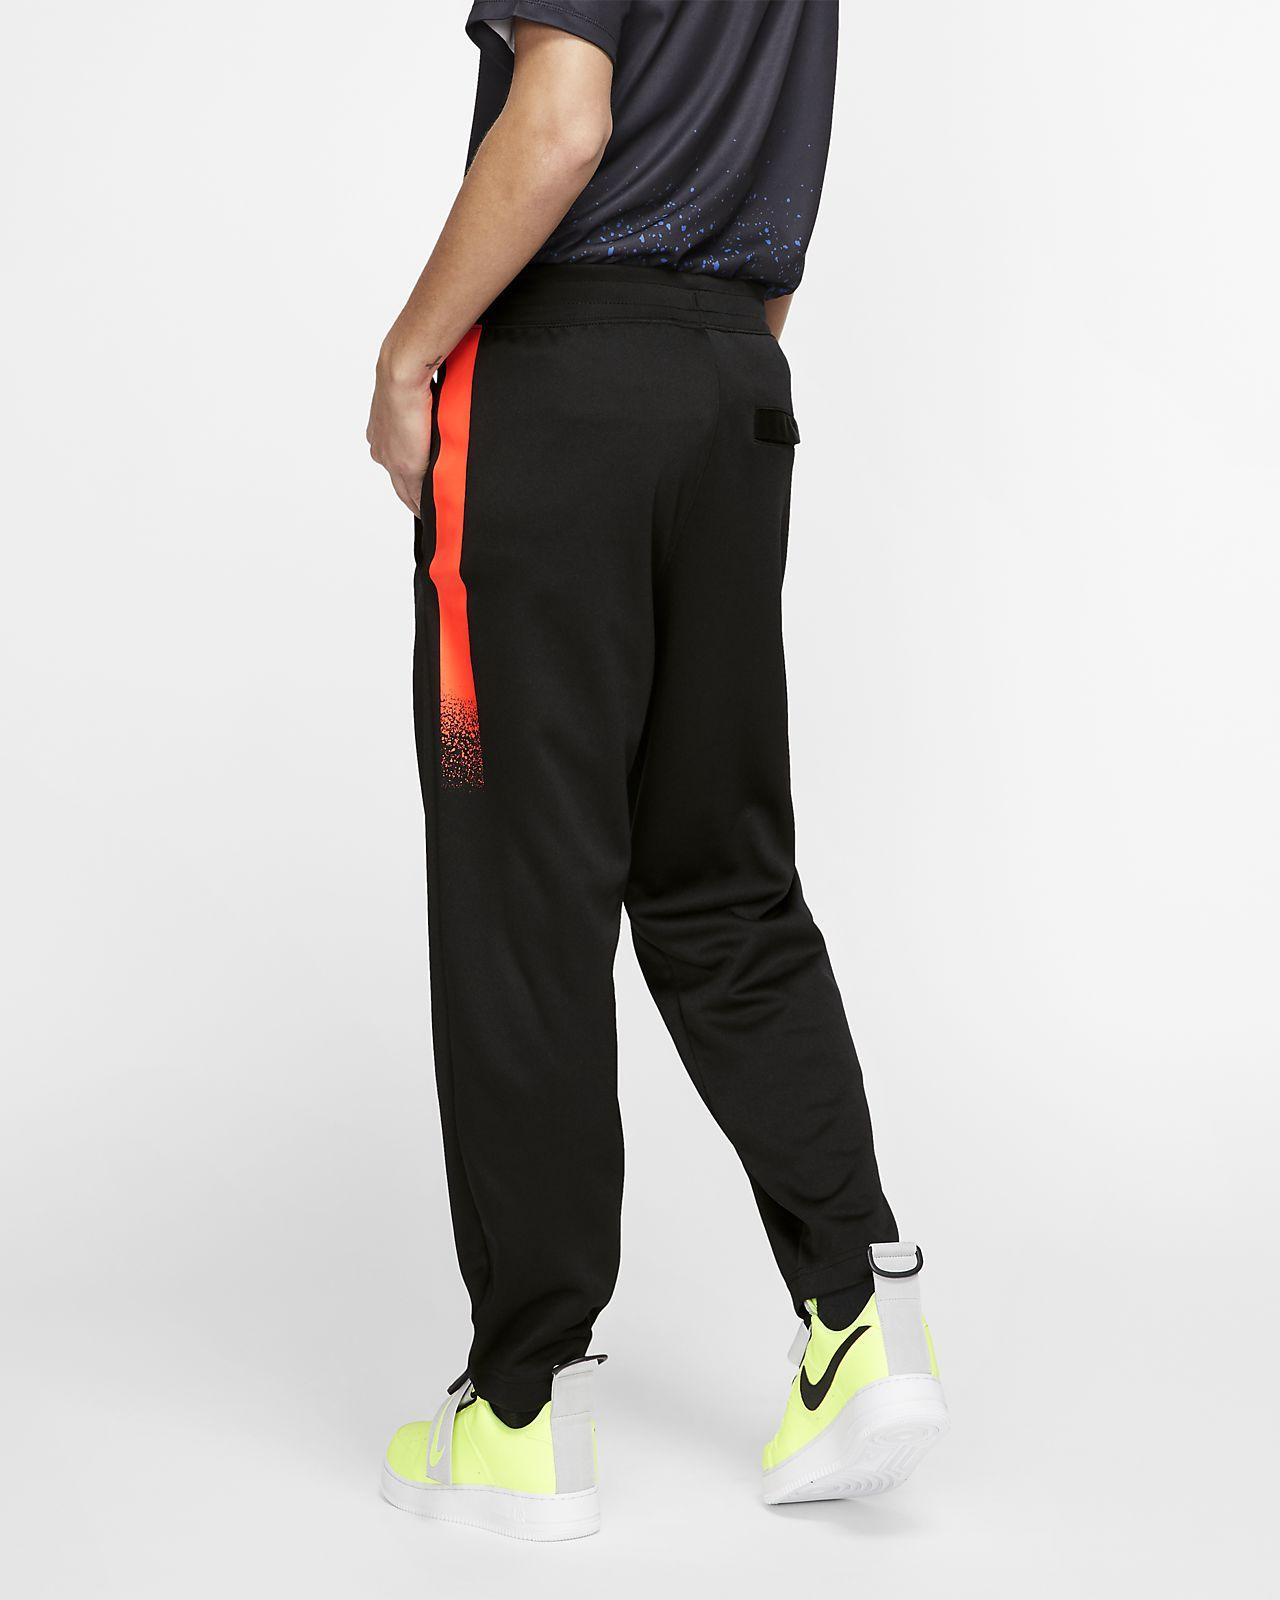 catch later super specials Pantalon Nike Sportswear pour Homme